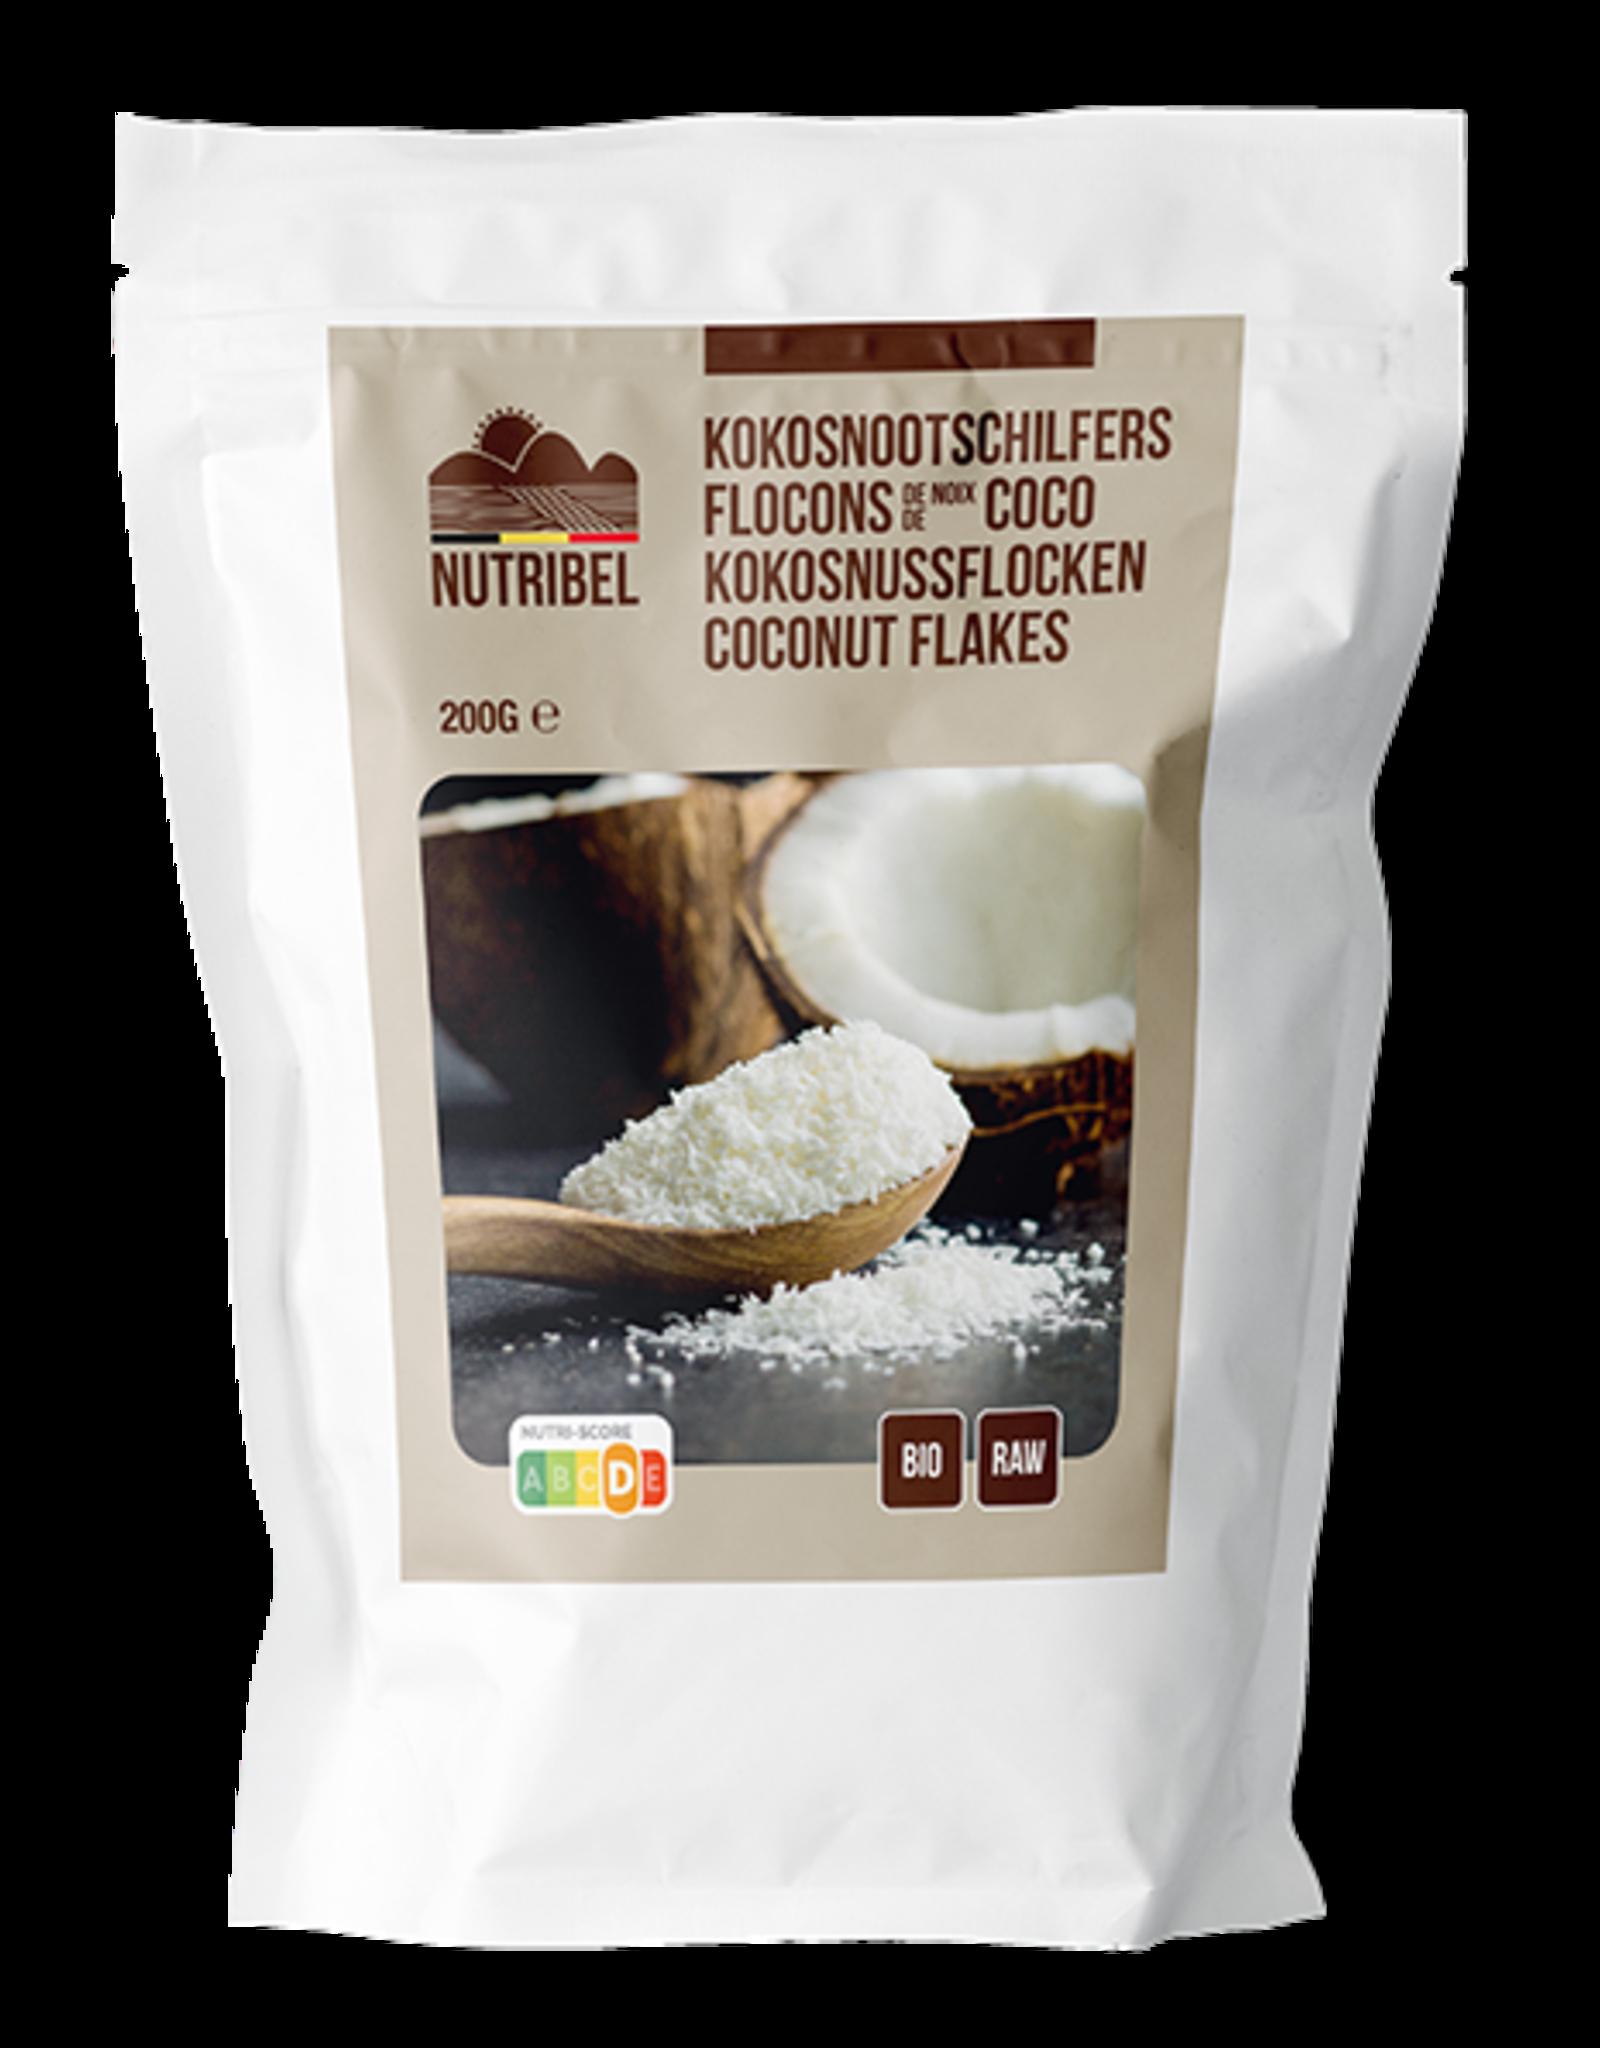 Nutribel Noix de coco déshydraté bio & raw 200g